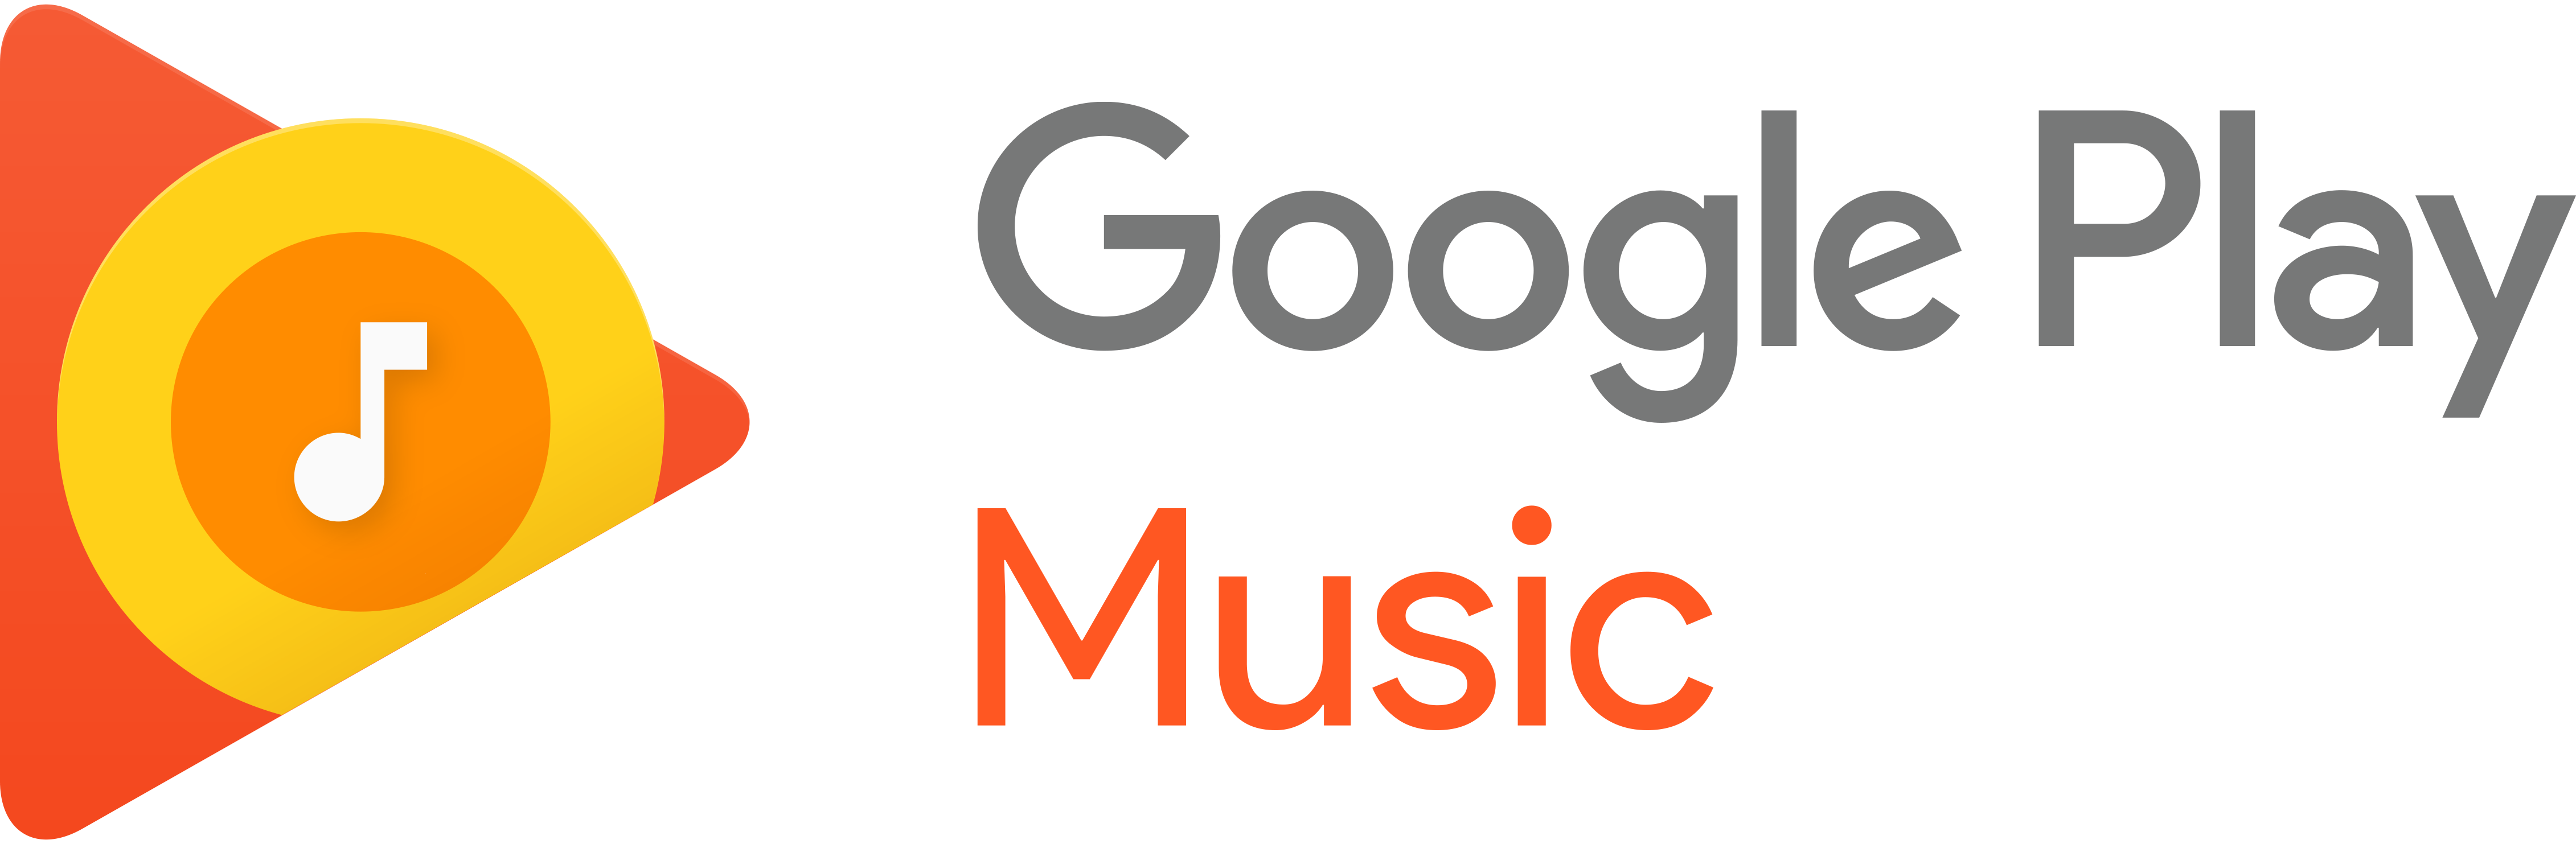 google_play_music_logo_big